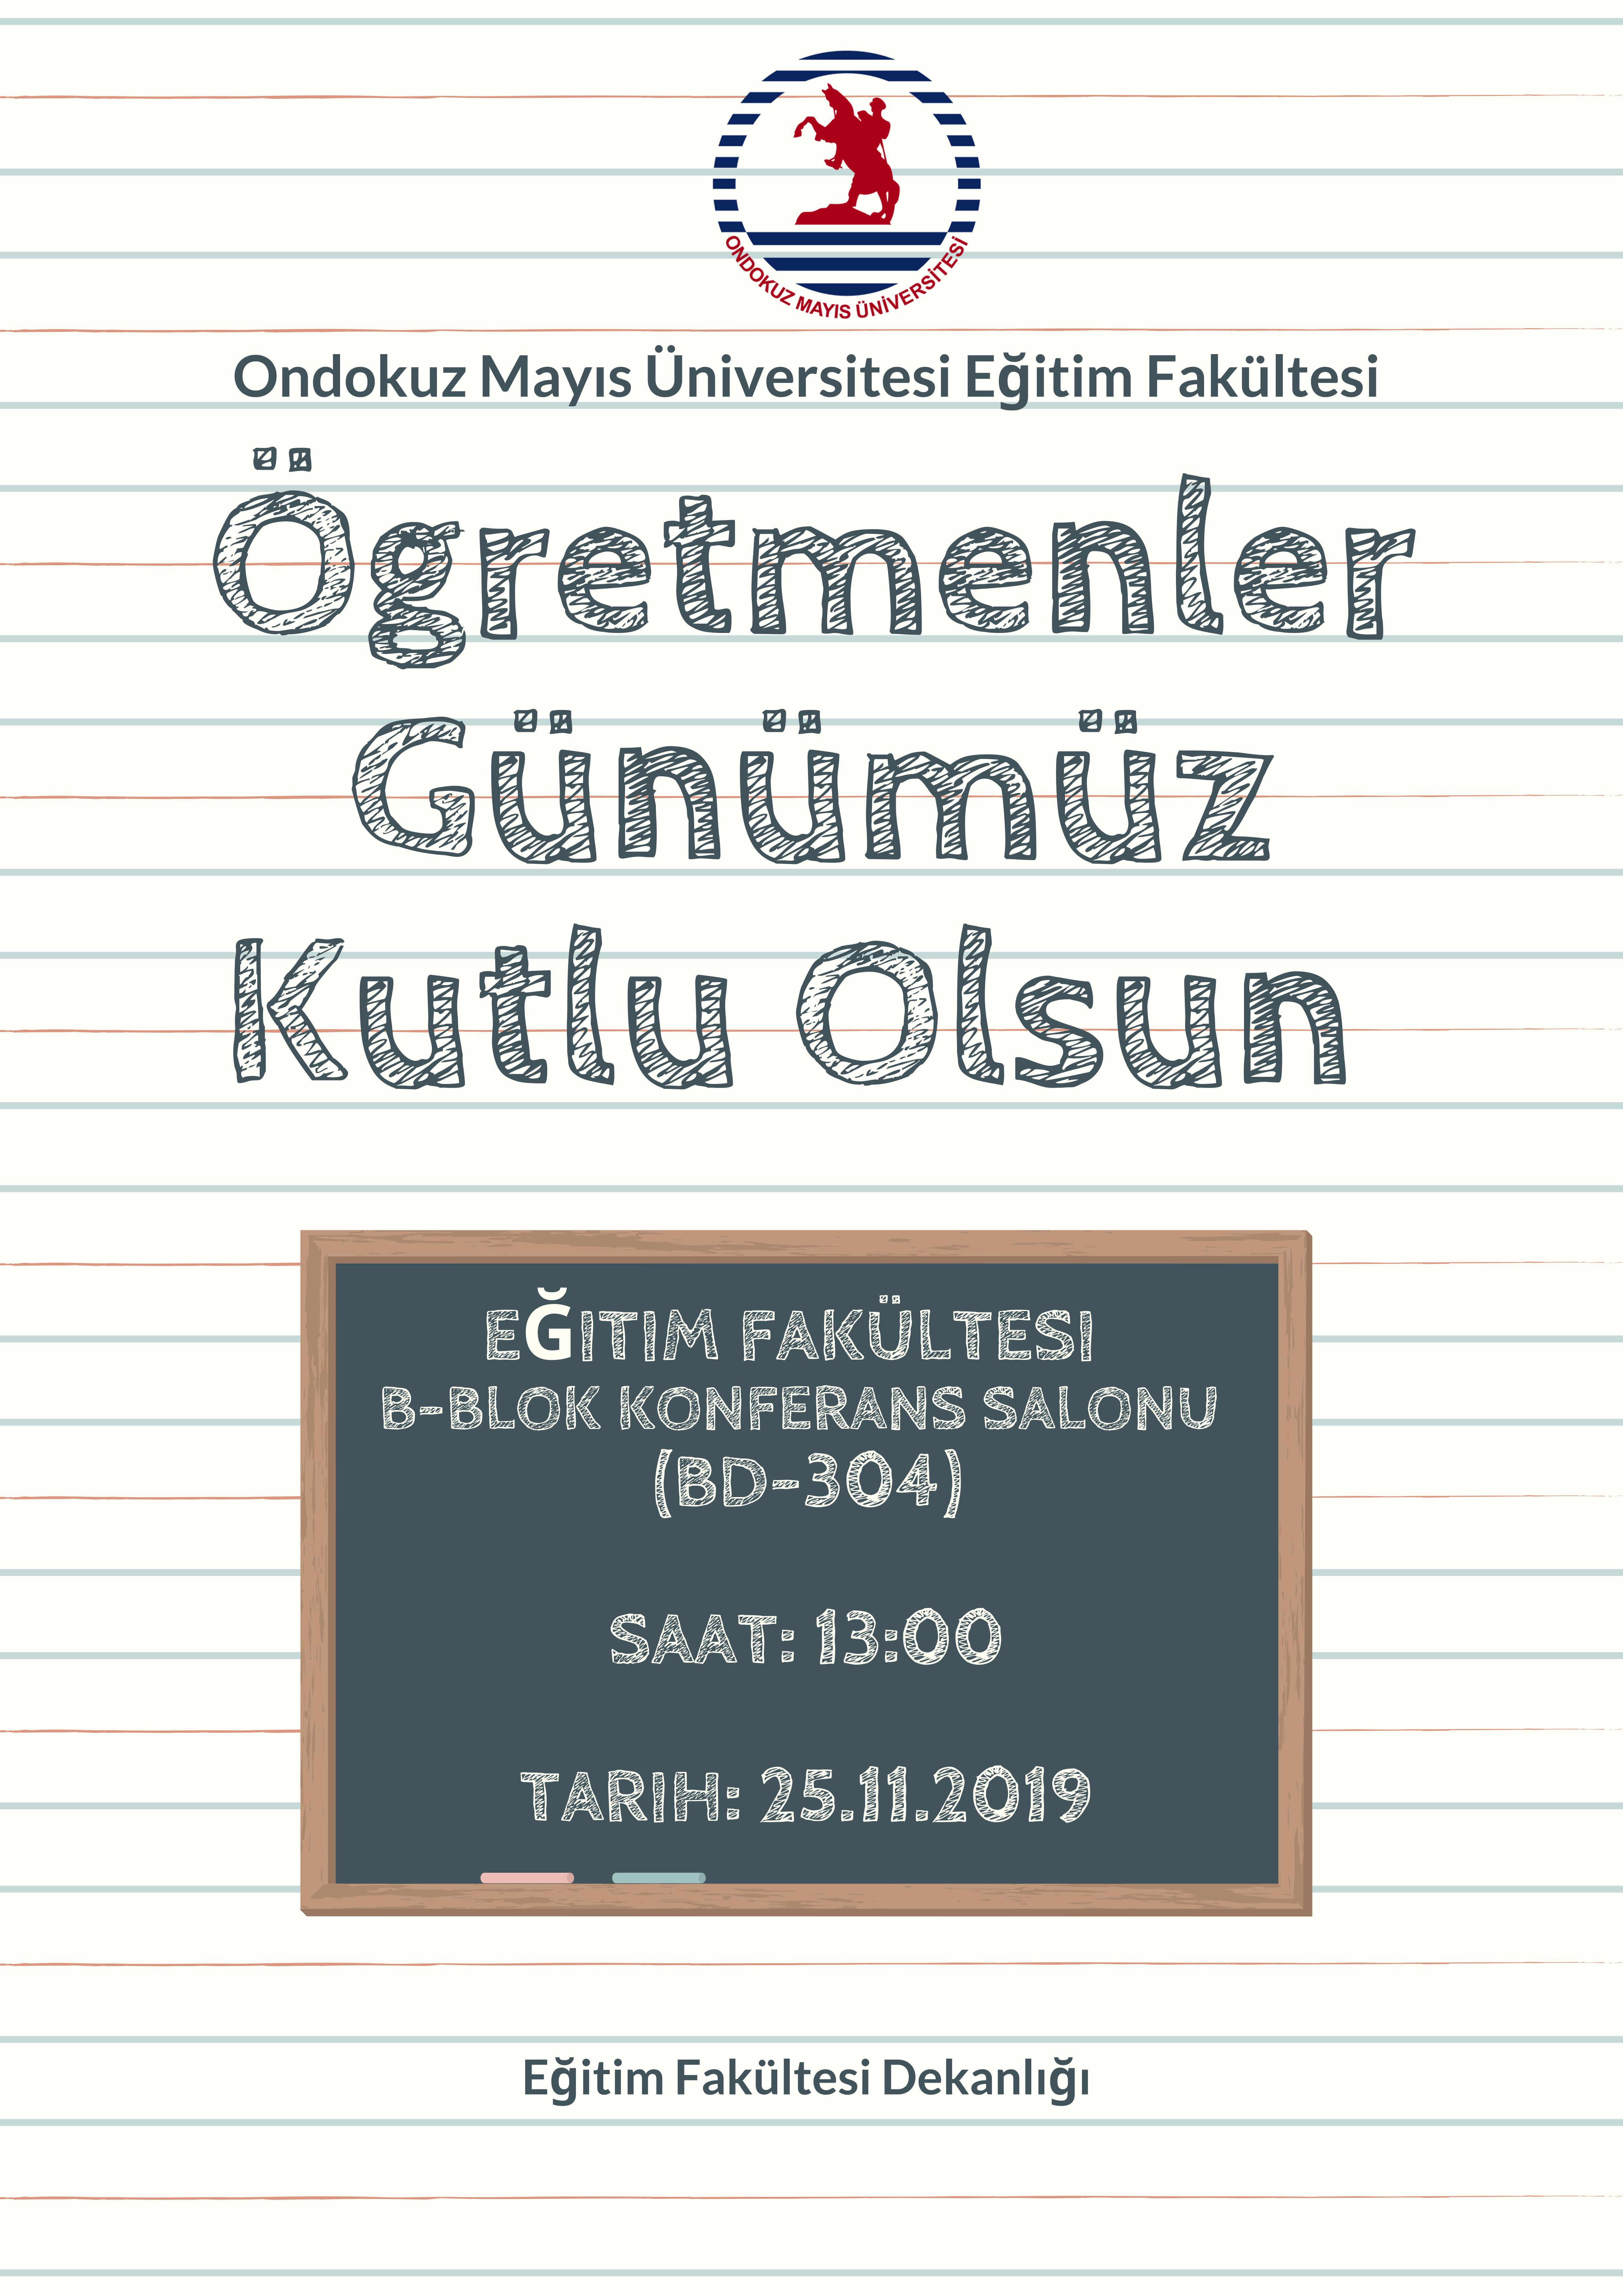 https://www.omu.edu.tr/sites/default/files/ogretmenler_gunumuz_kutlu_olsun.jpg